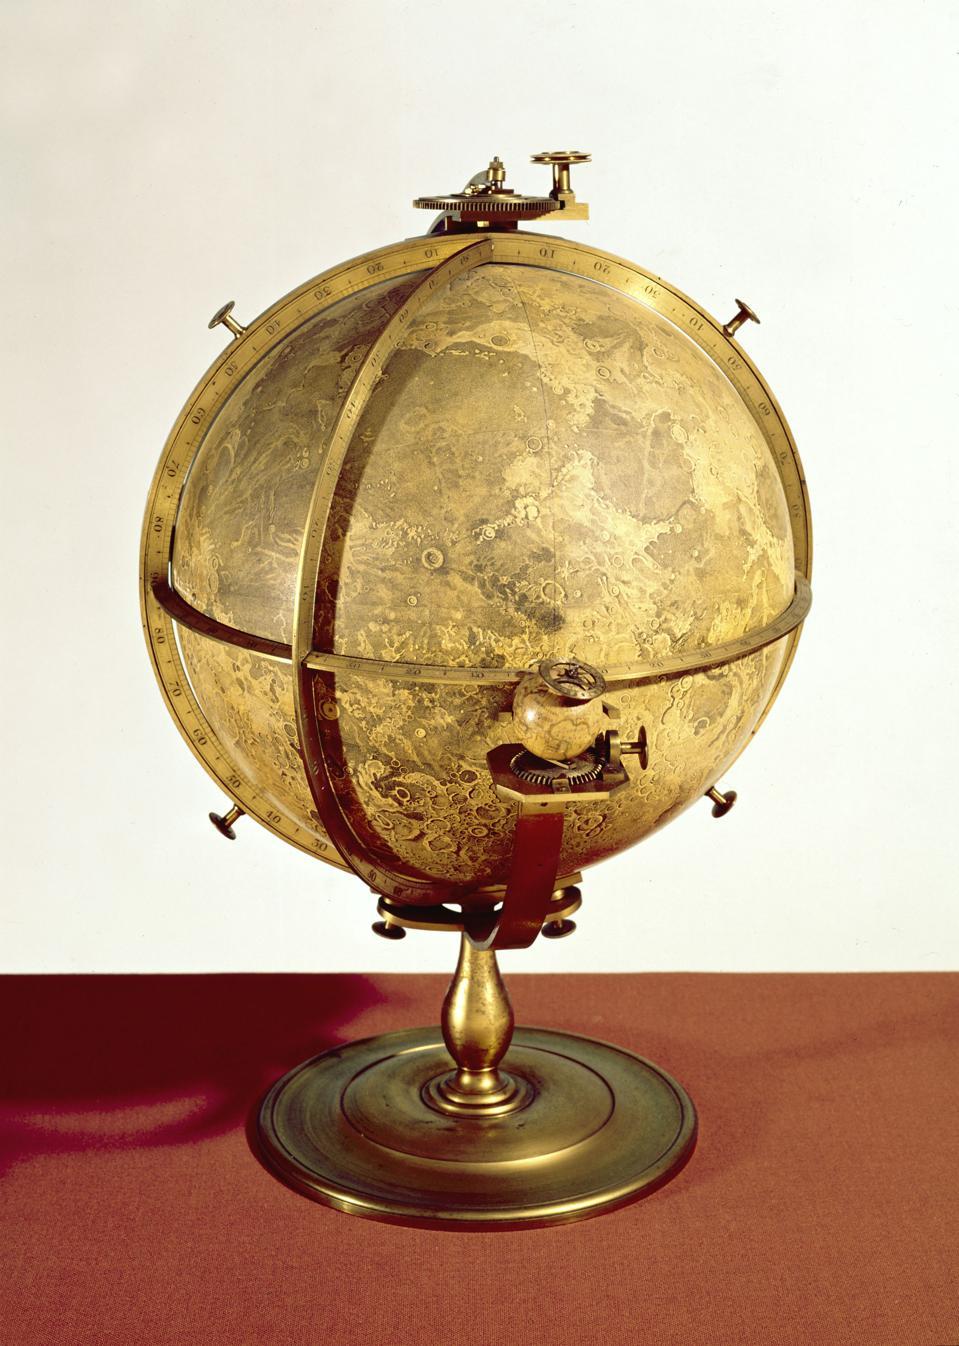 Lunar globe with mechanical stand, 1797.